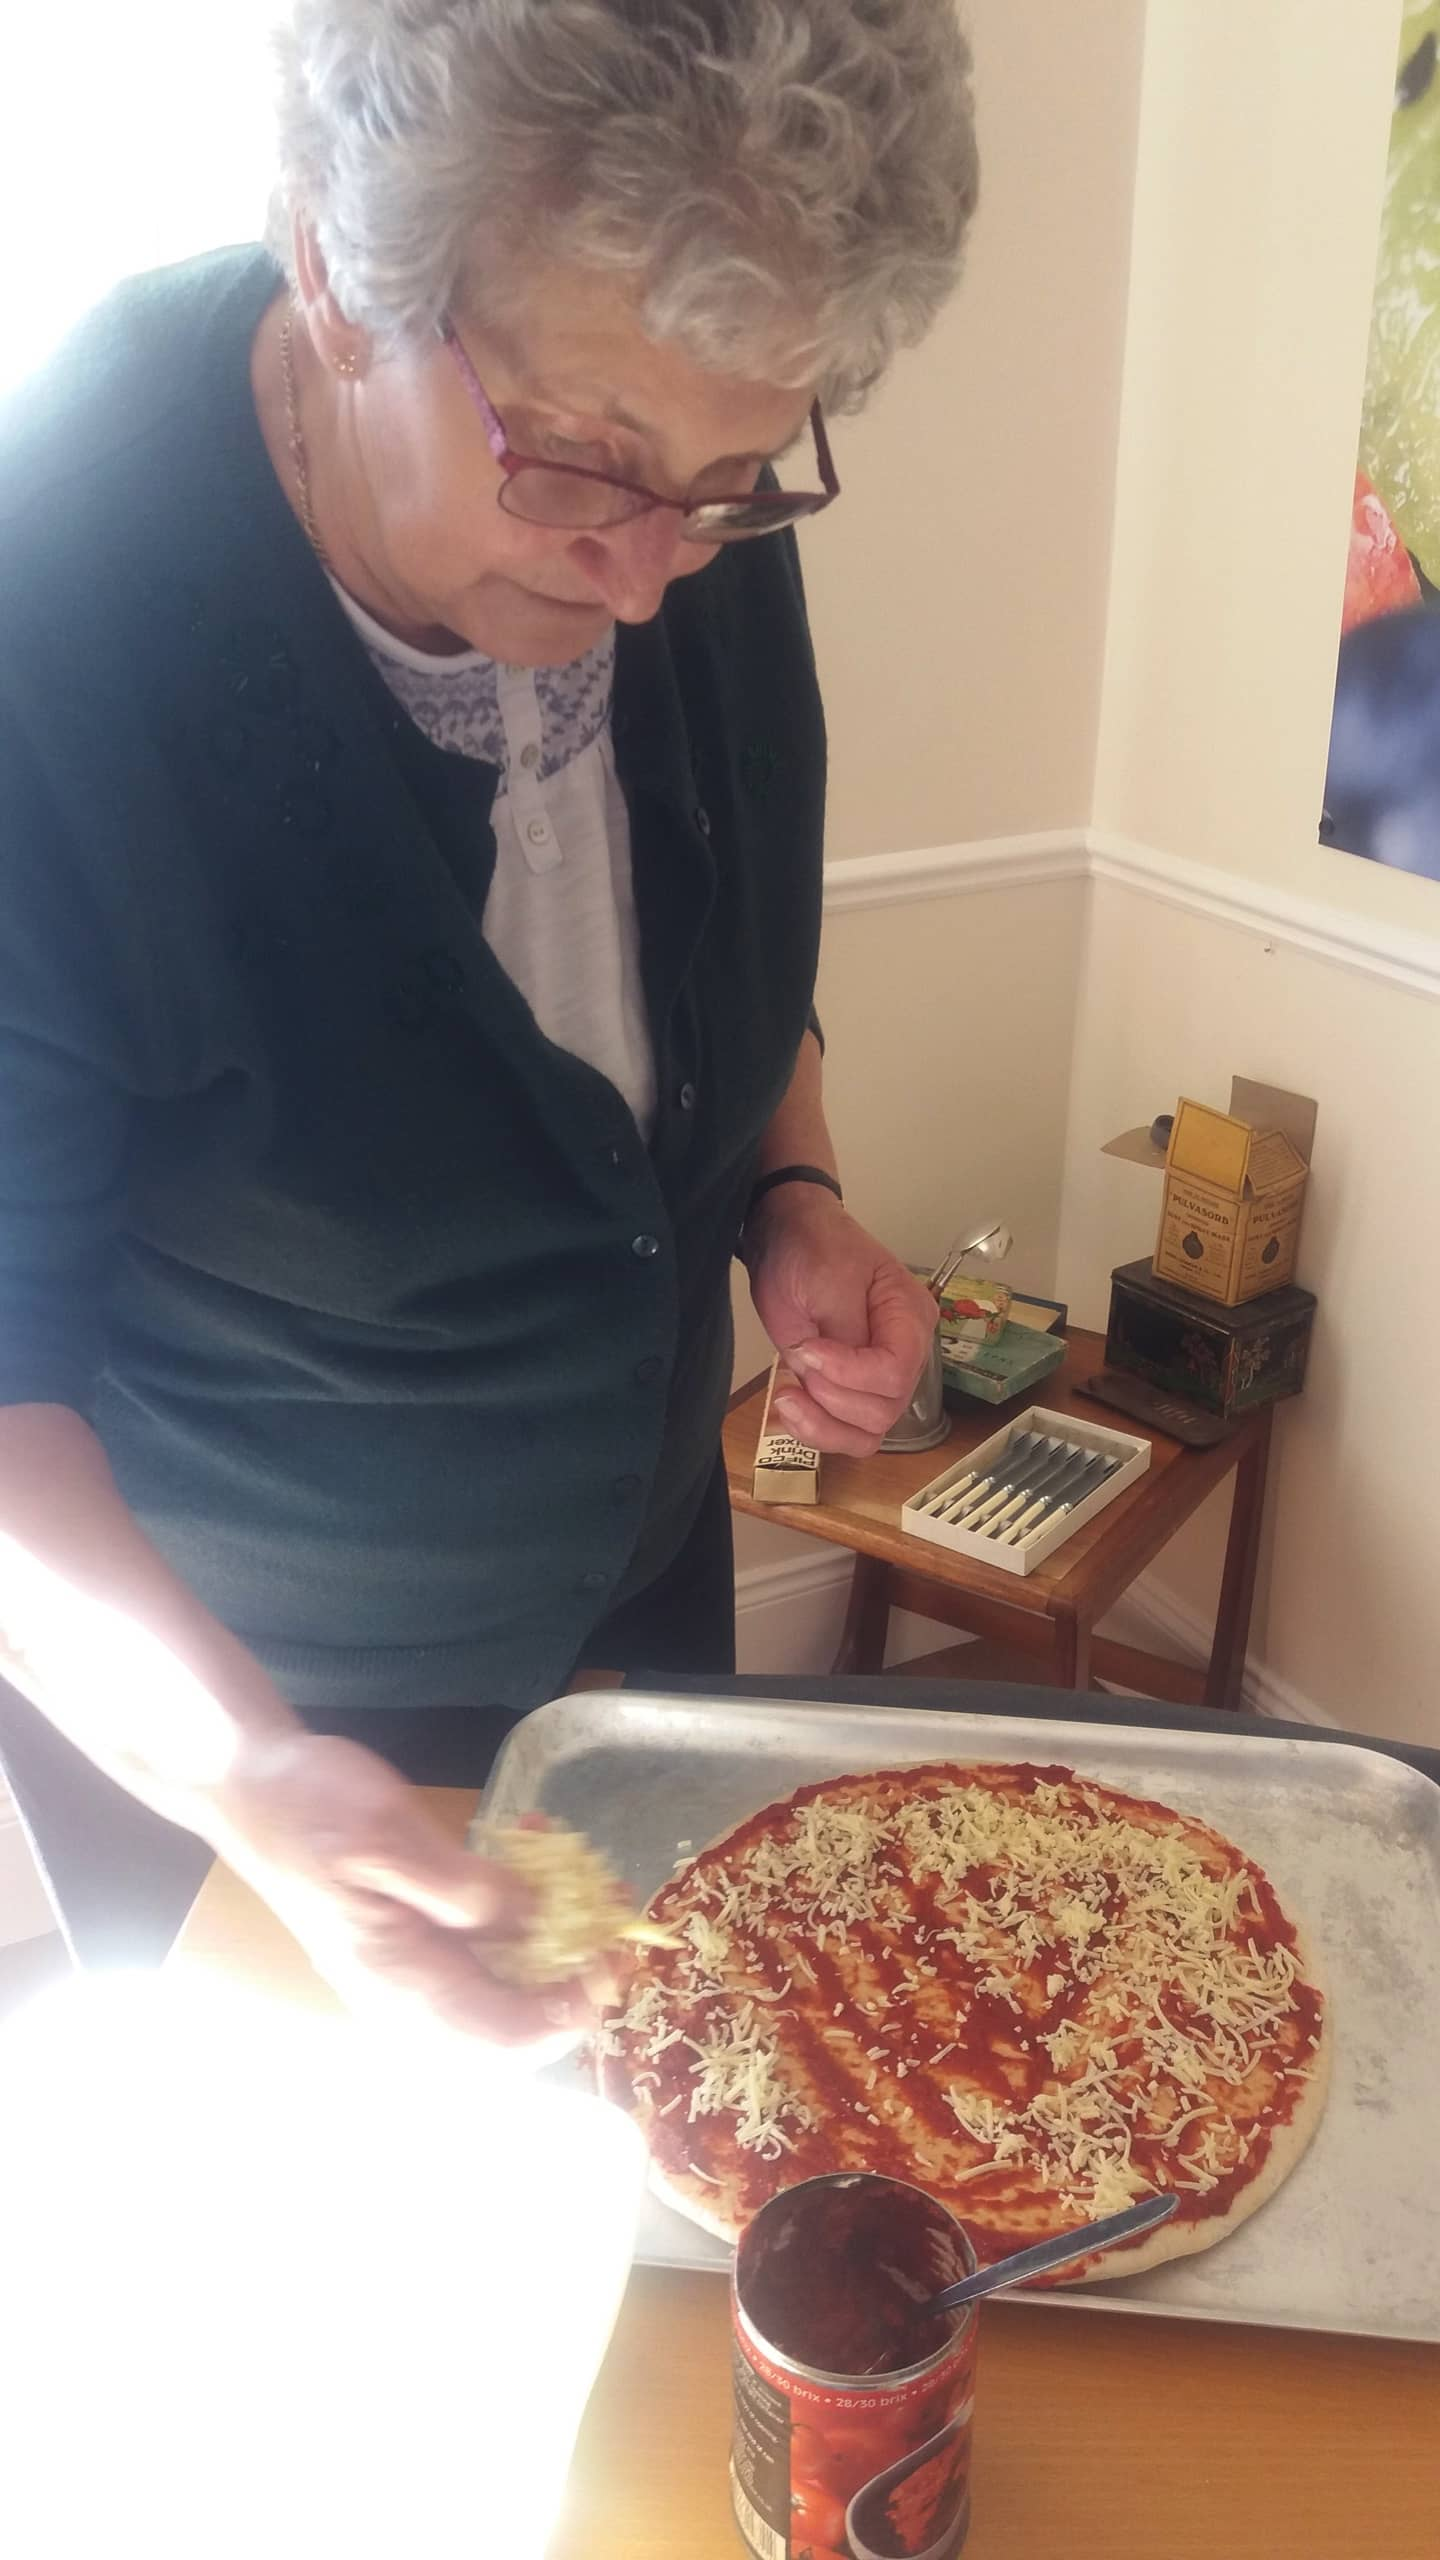 Resident carefully creating her pizza.